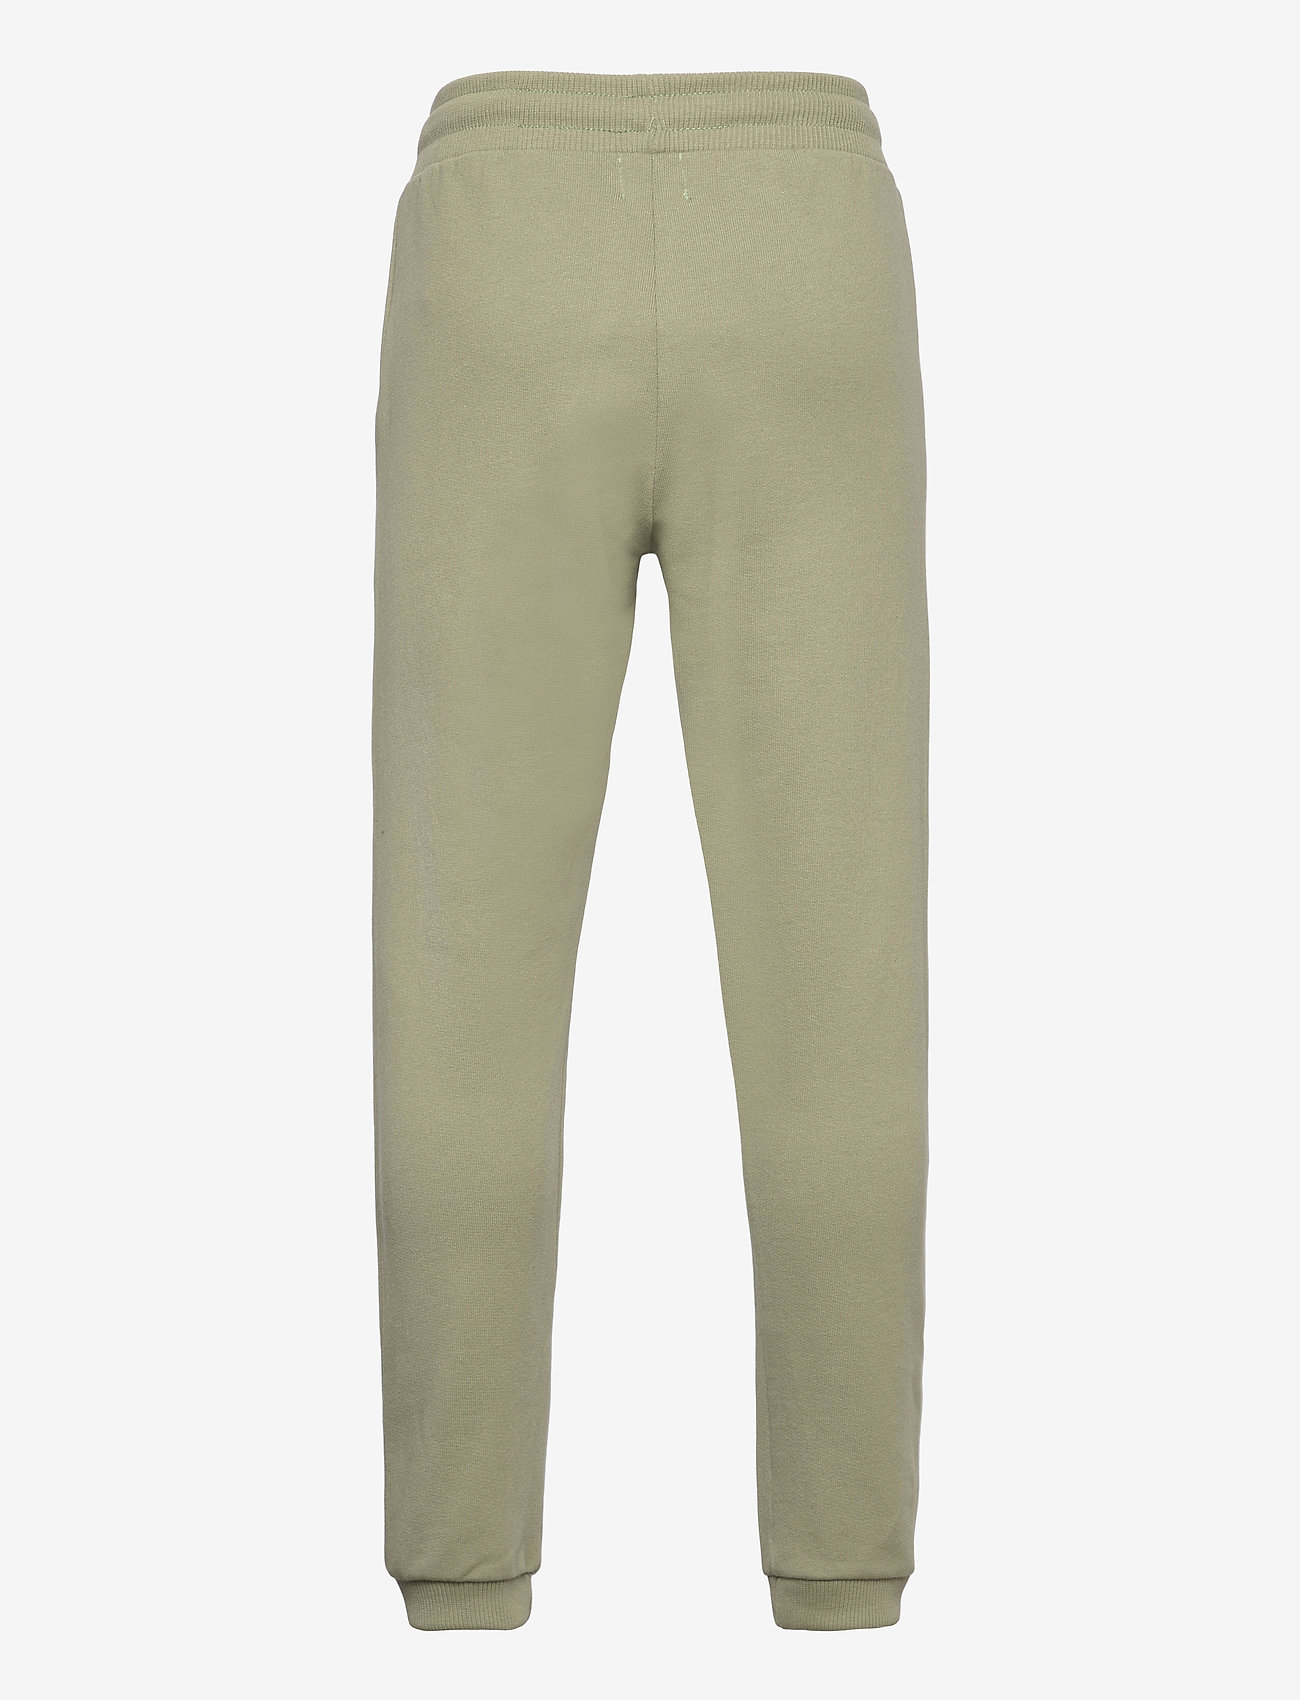 Mini A Ture - Even pants, K - sweatpants - oil green - 1